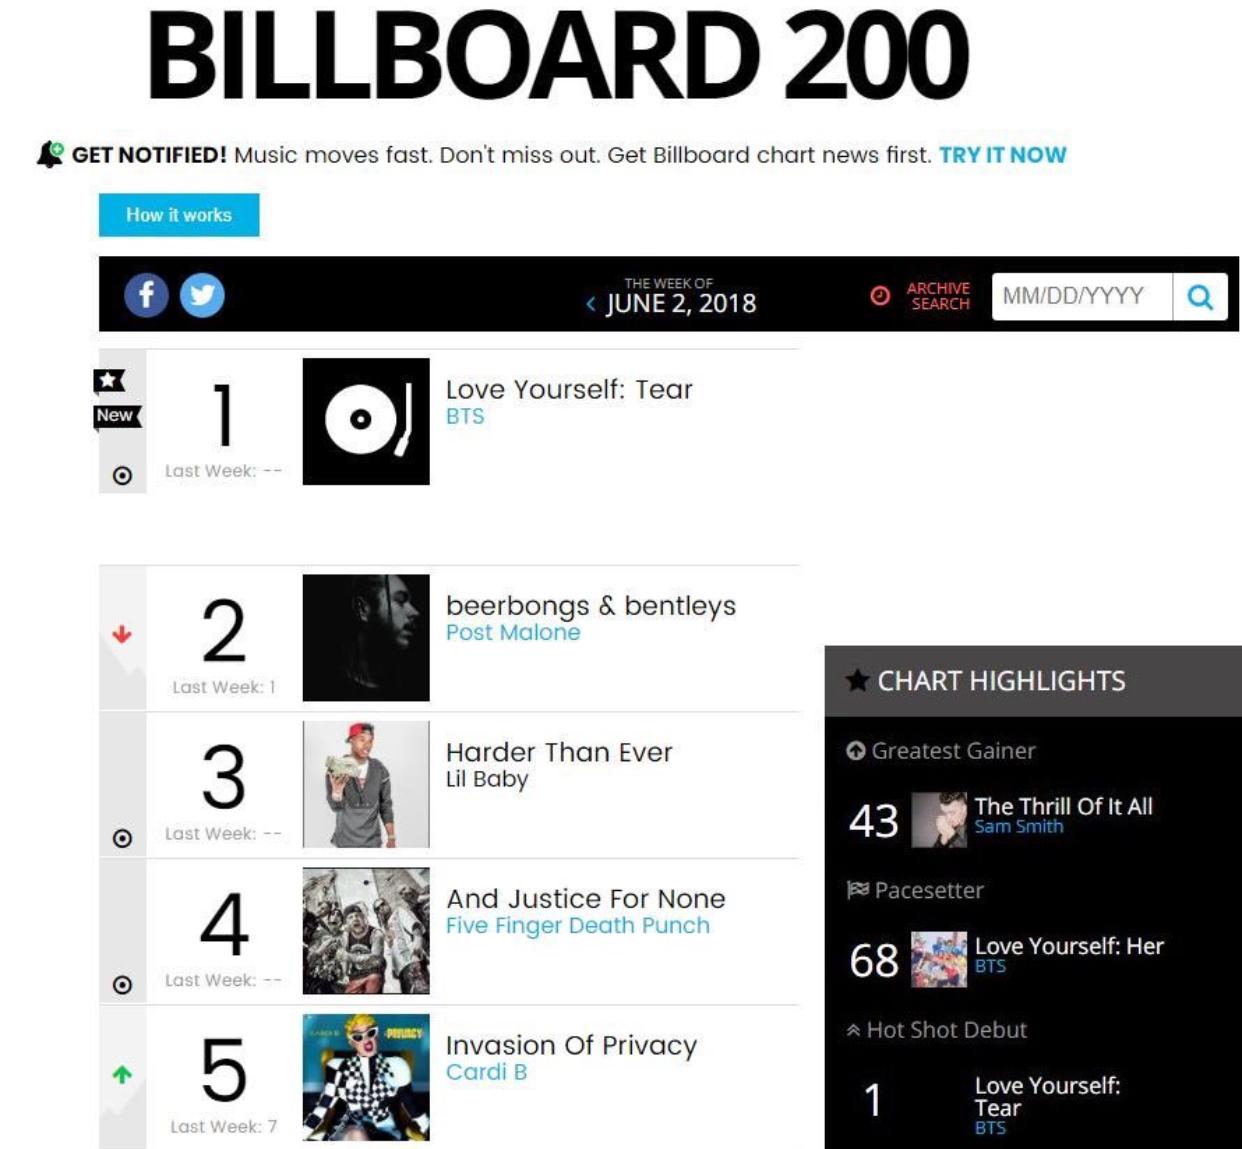 (Source Pict: Billboard)